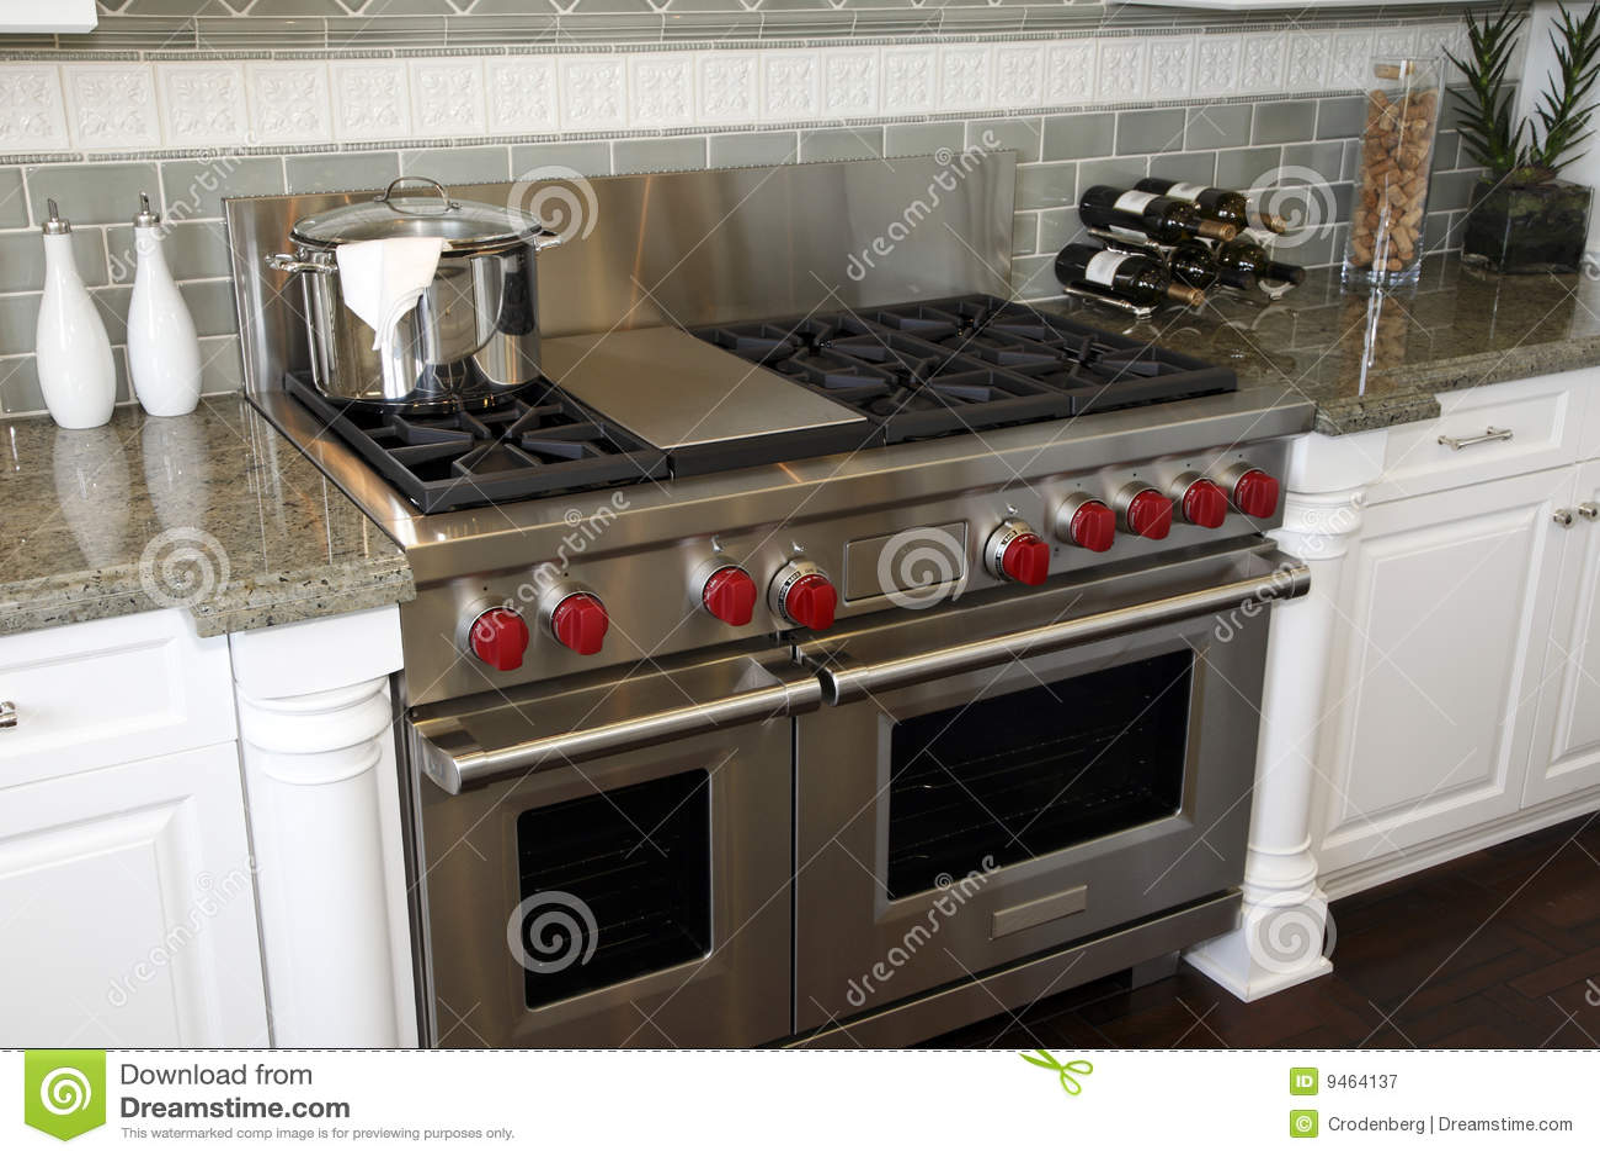 Upscale Kitchen Appliances Luxury Kitchen Stove Royalty Free Stock Photography Image 9464137